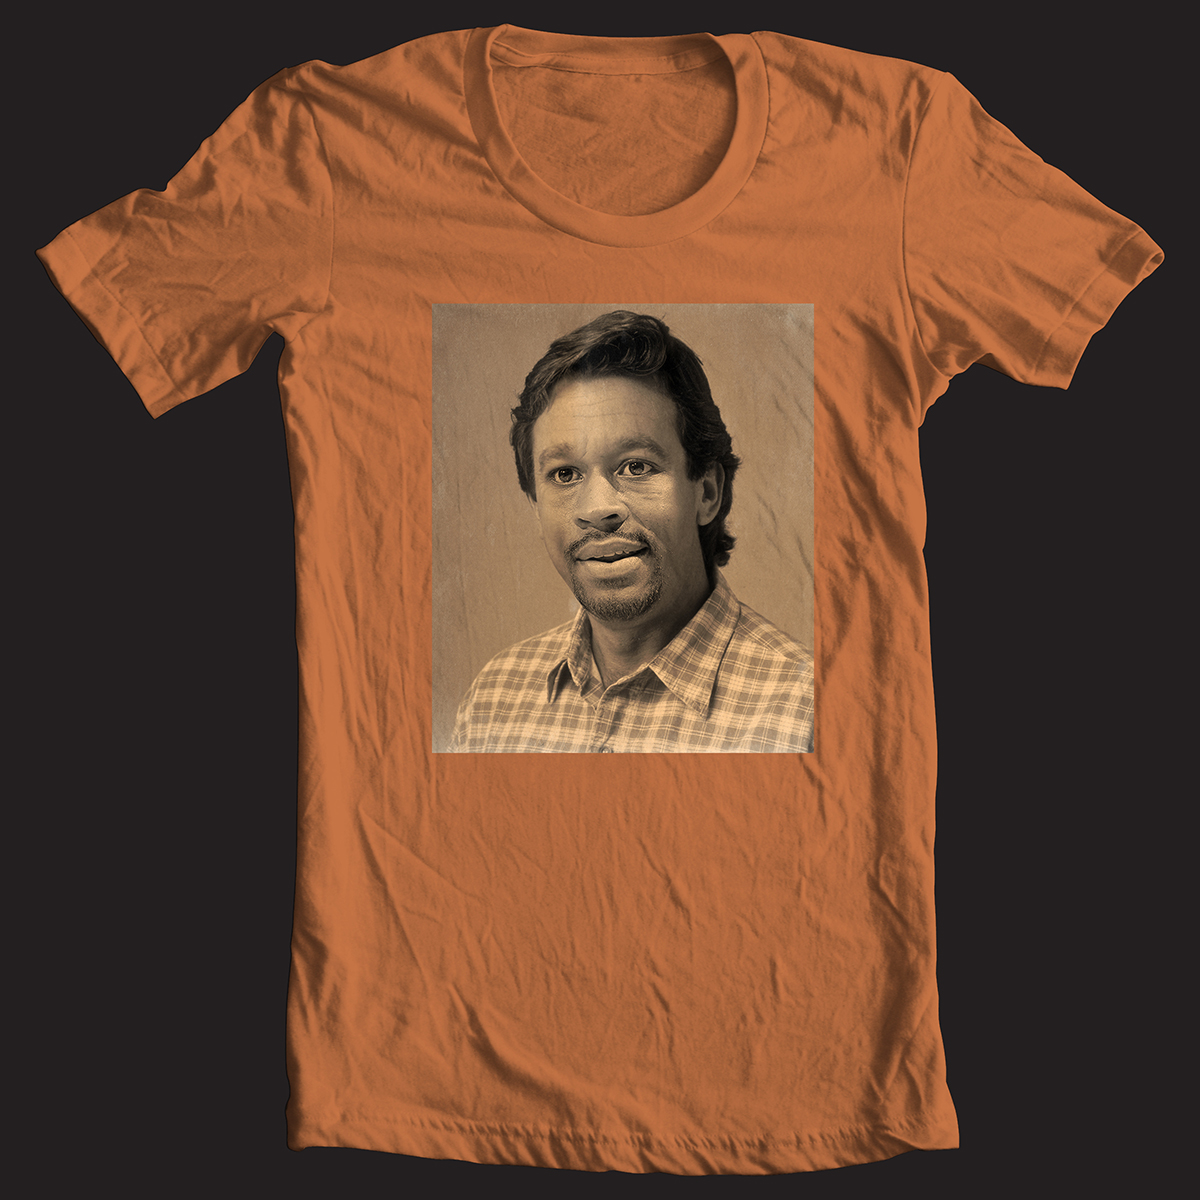 shirt_timalleniverson.jpg